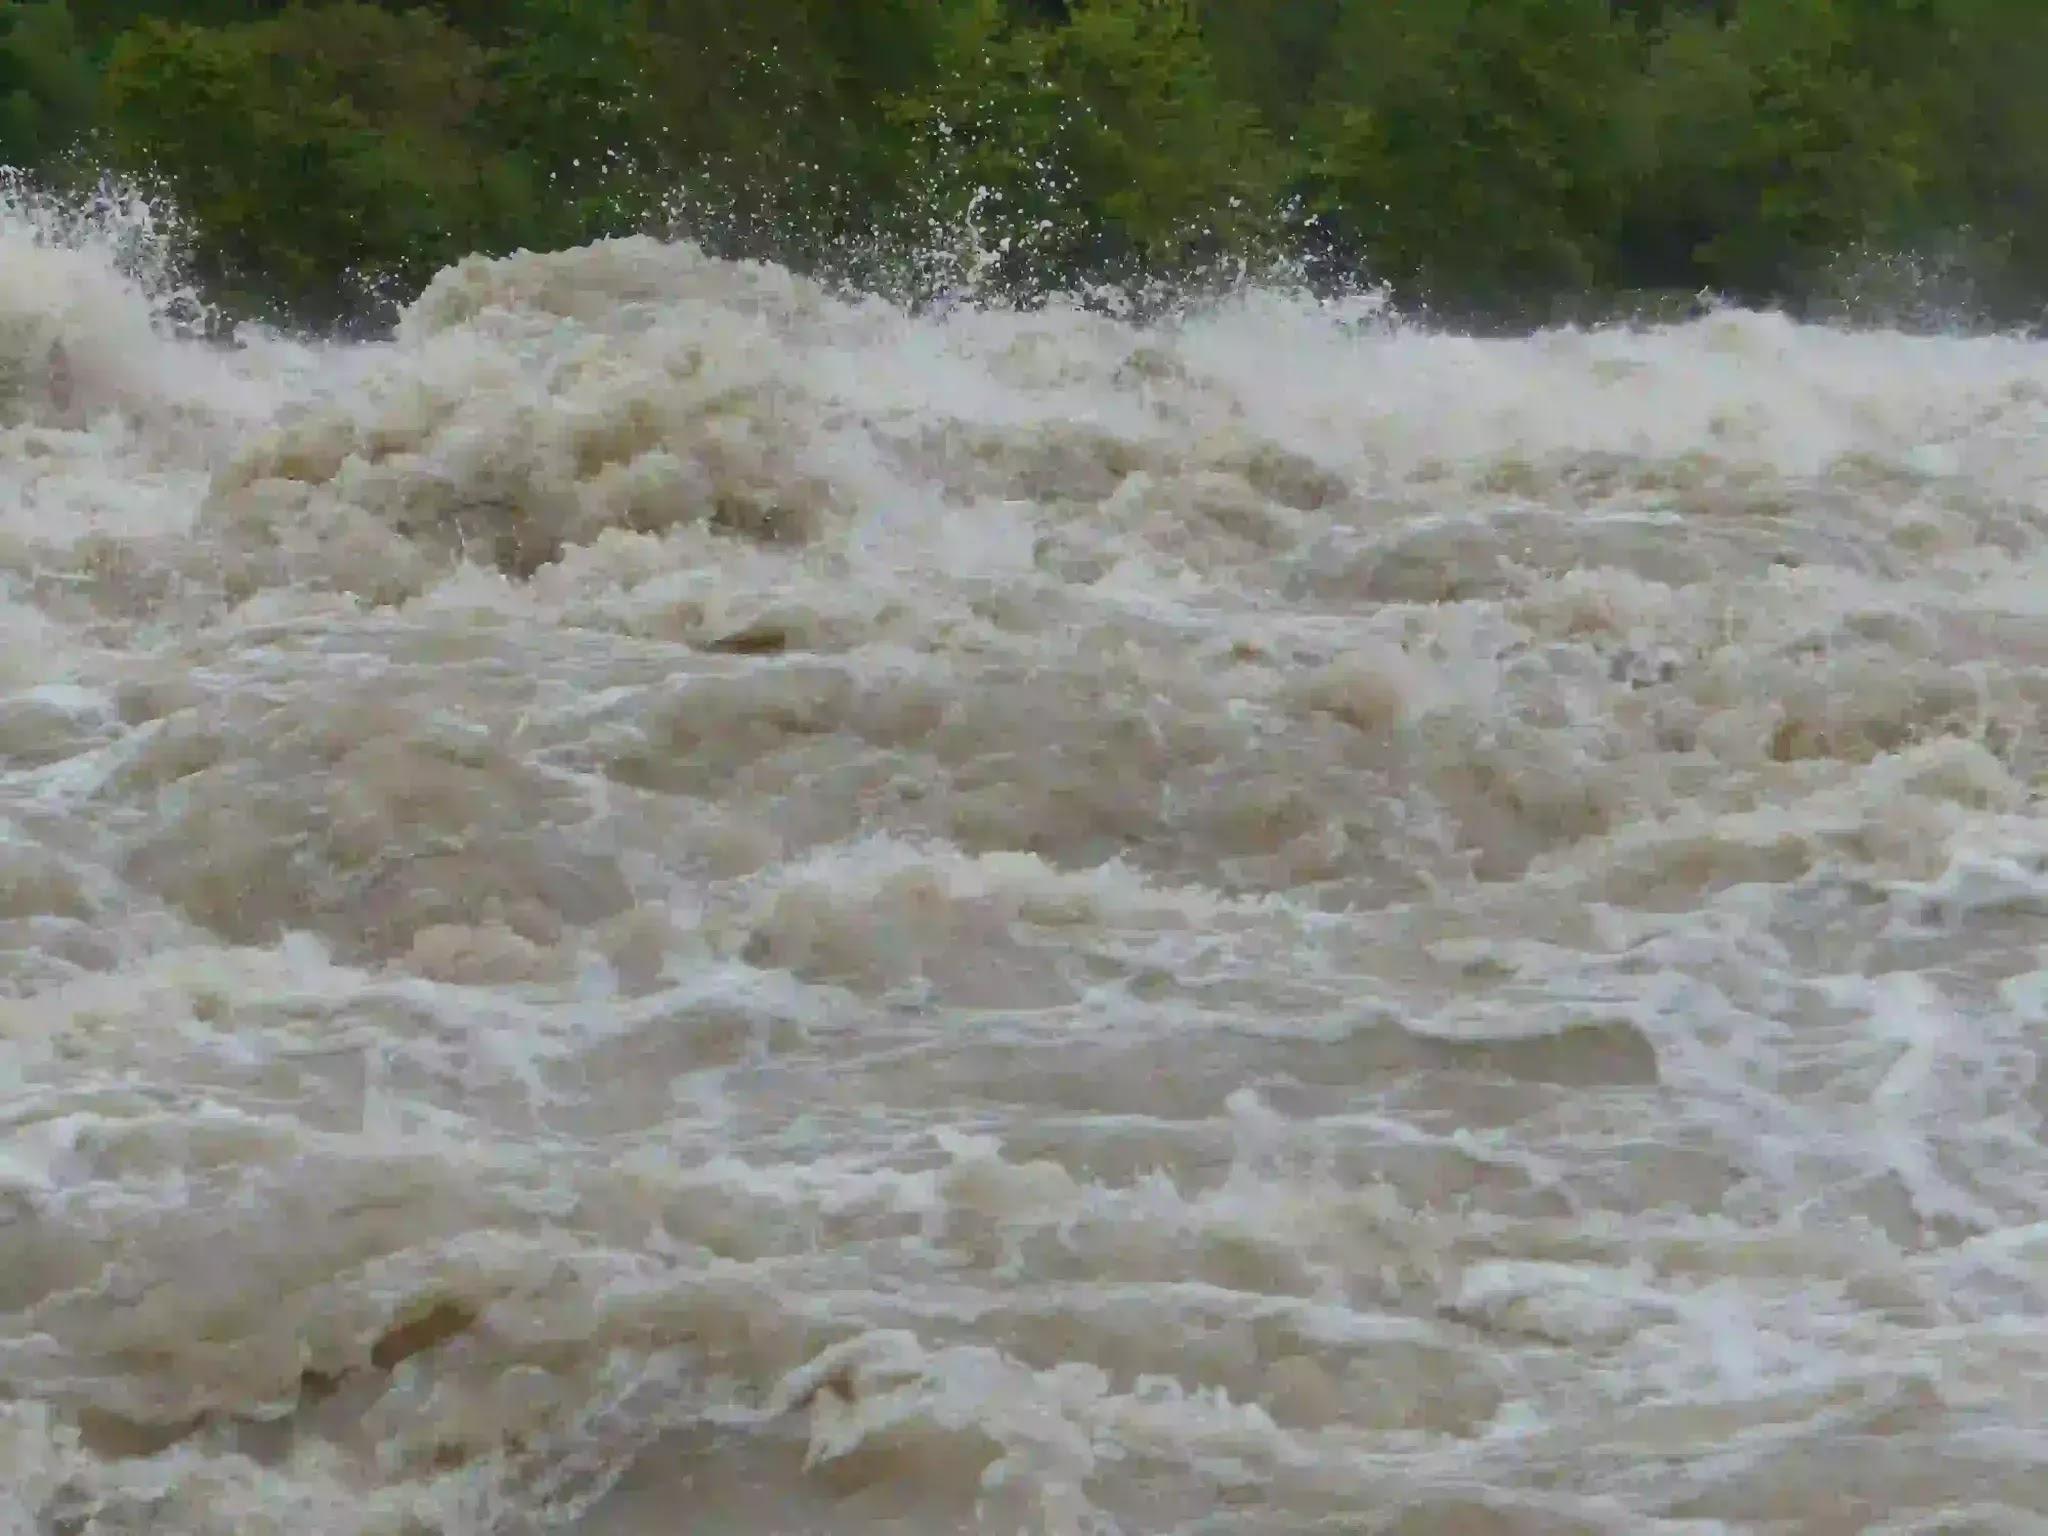 Flood in Harappan forest in Uttarakhand